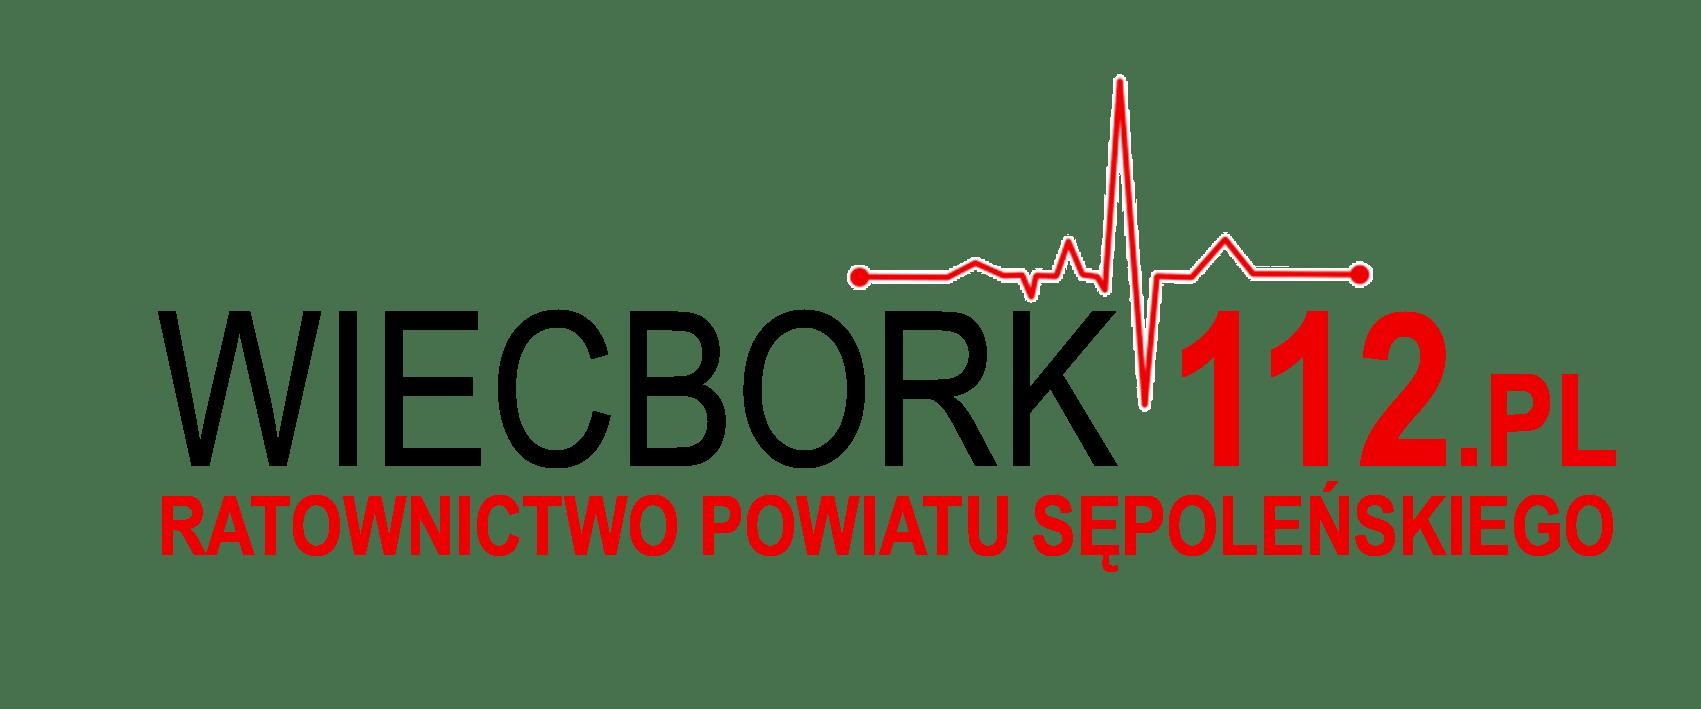 Wiecbork112.pl